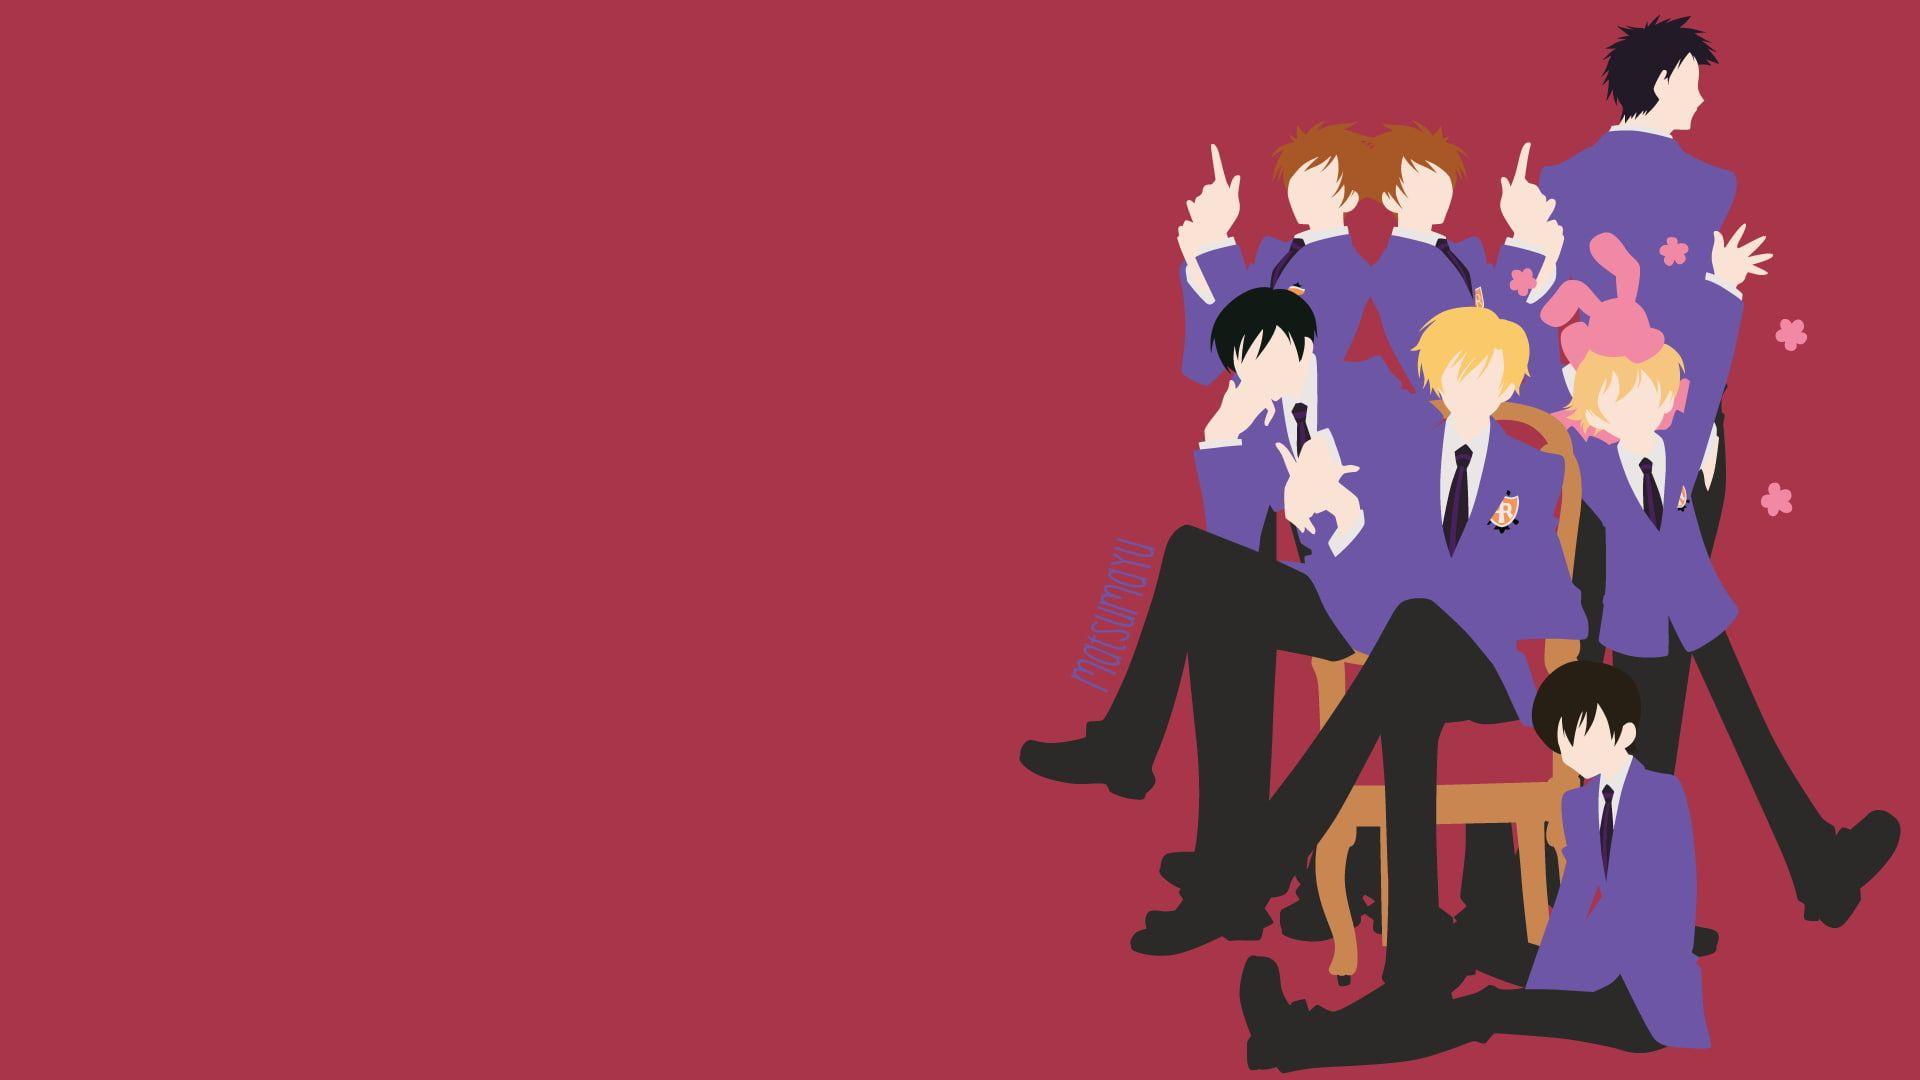 Anime Ouran High School Host Club Haruhi Fujioka Hikaru Hitachiin